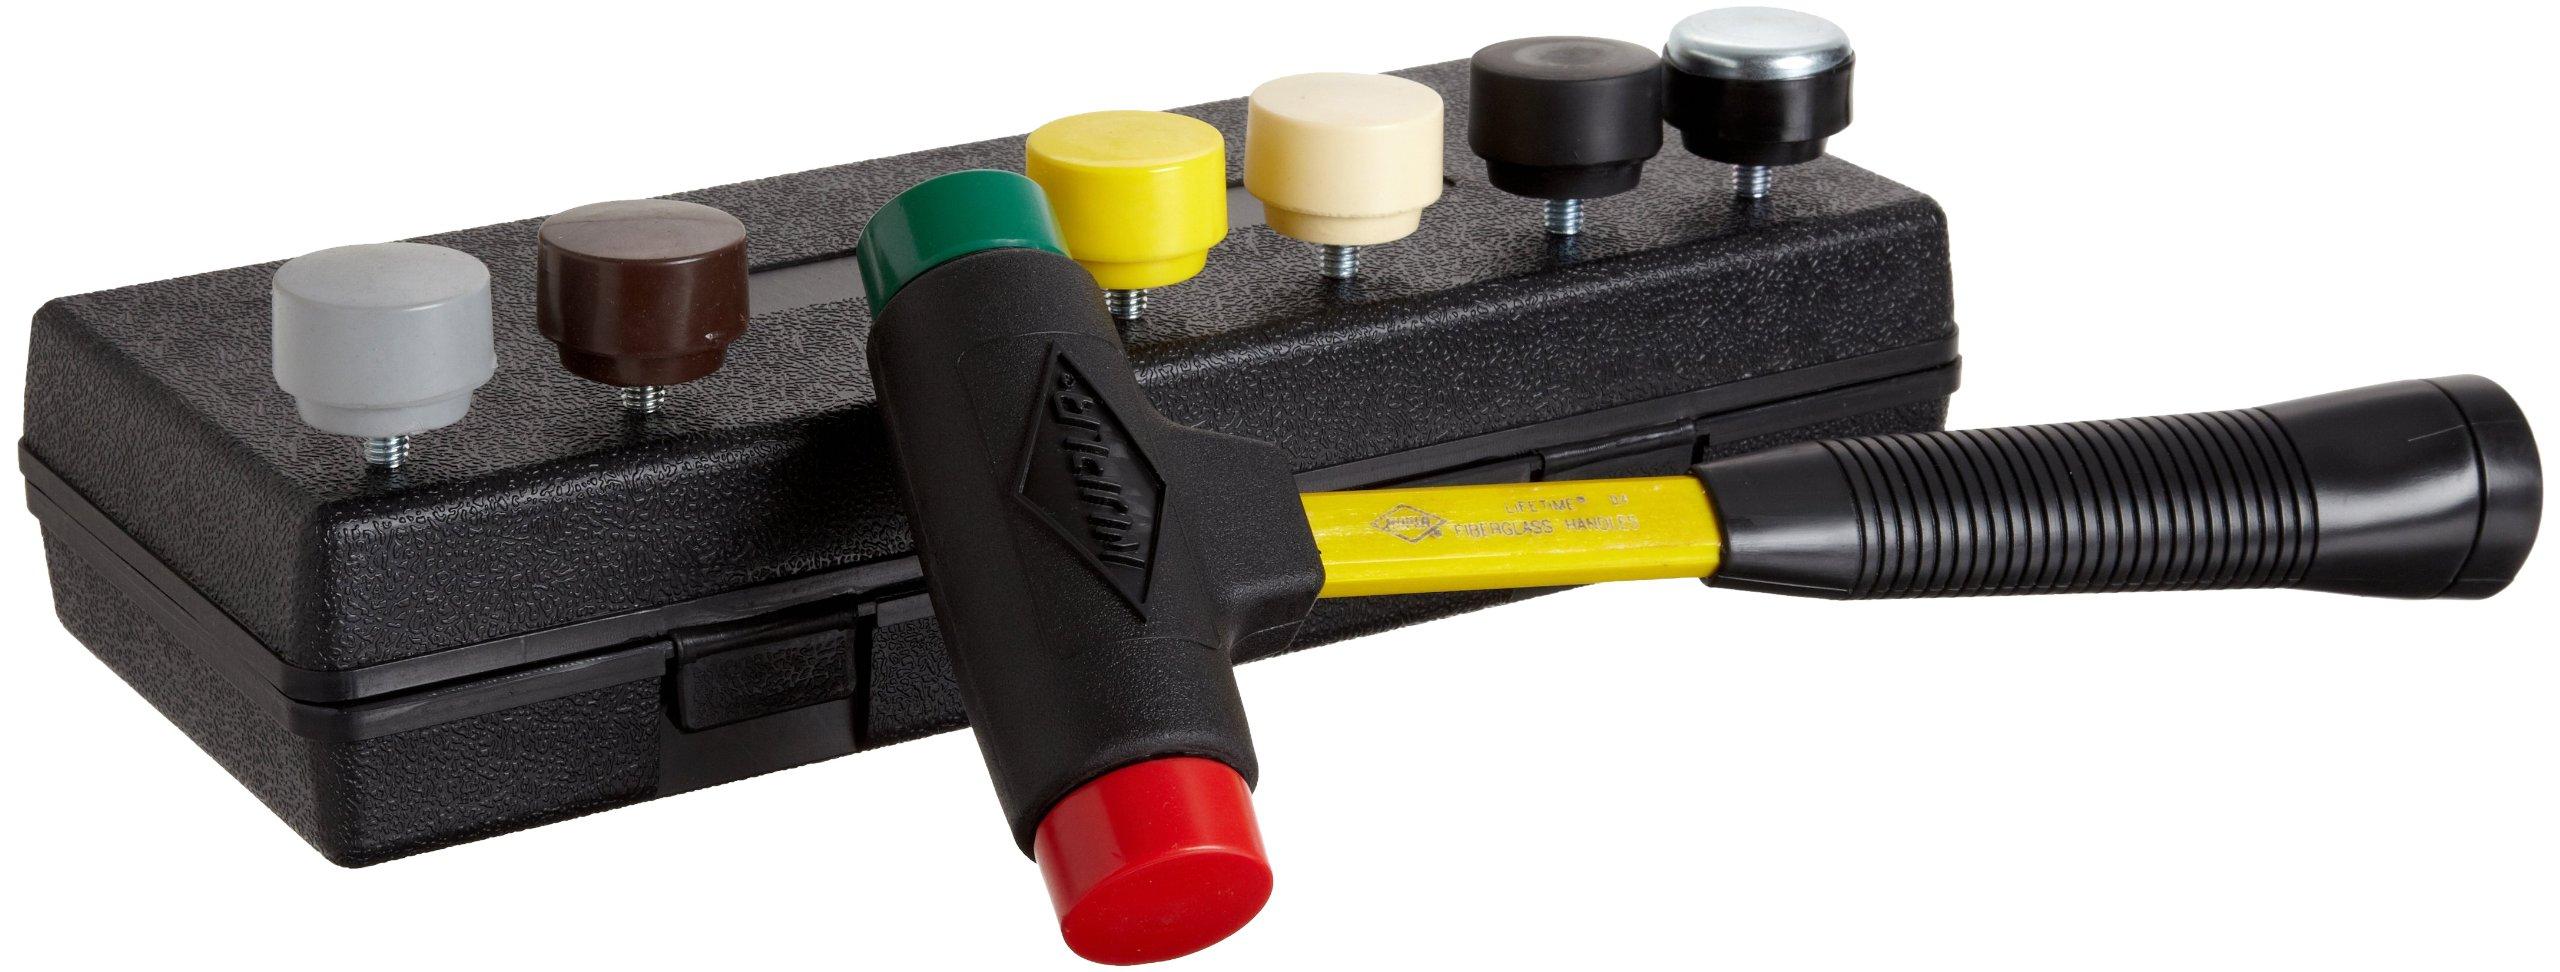 Nupla SPI-156-S6 9 Piece Quick Change Impax Sledge Power Drive Set with Carrying Case, C Grip, 12.5'' Long Handle